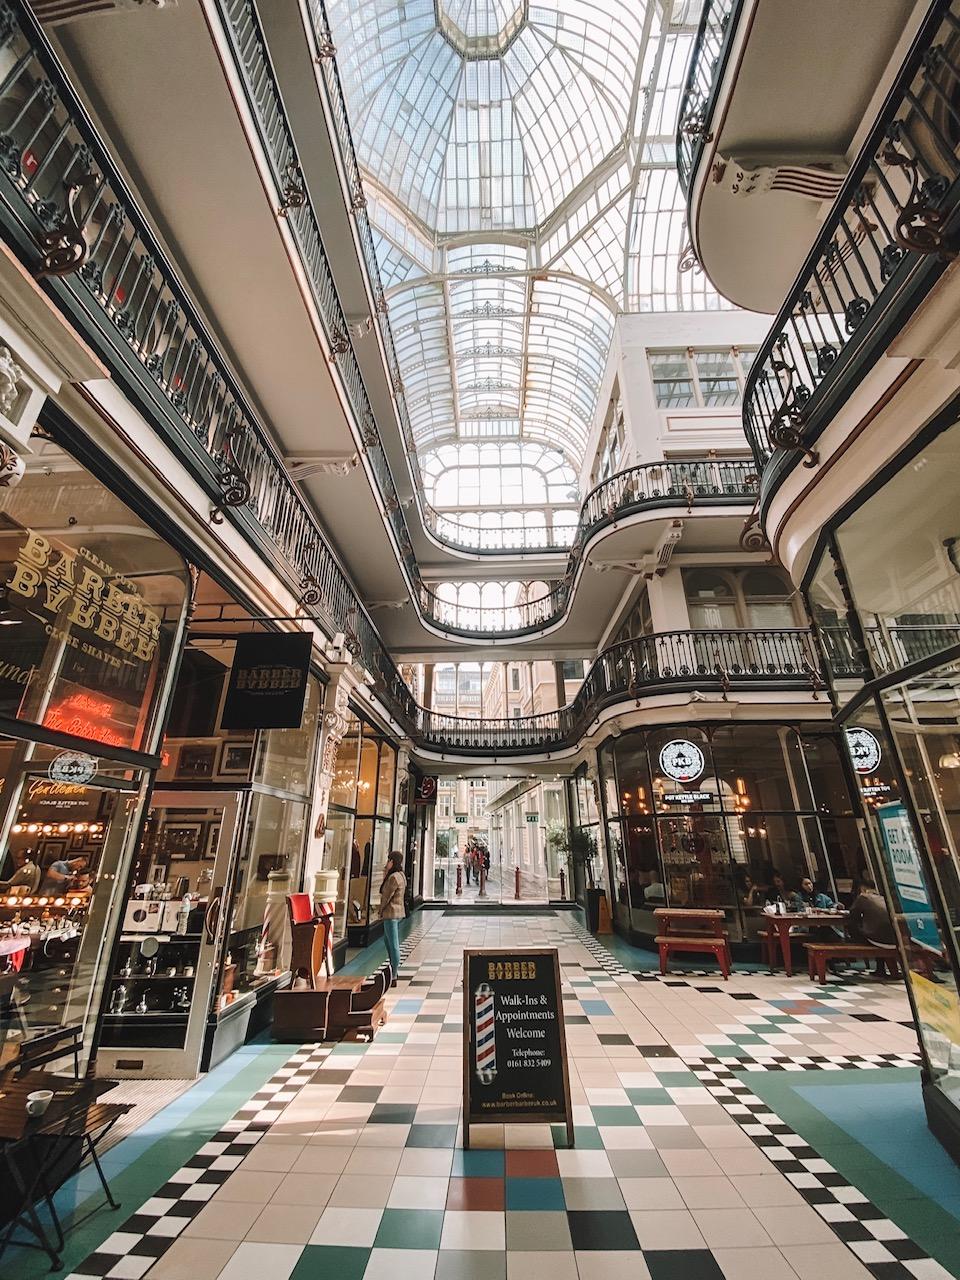 Travel blogger Amanda's OK shops at Barton Arcade in Manchester, UK